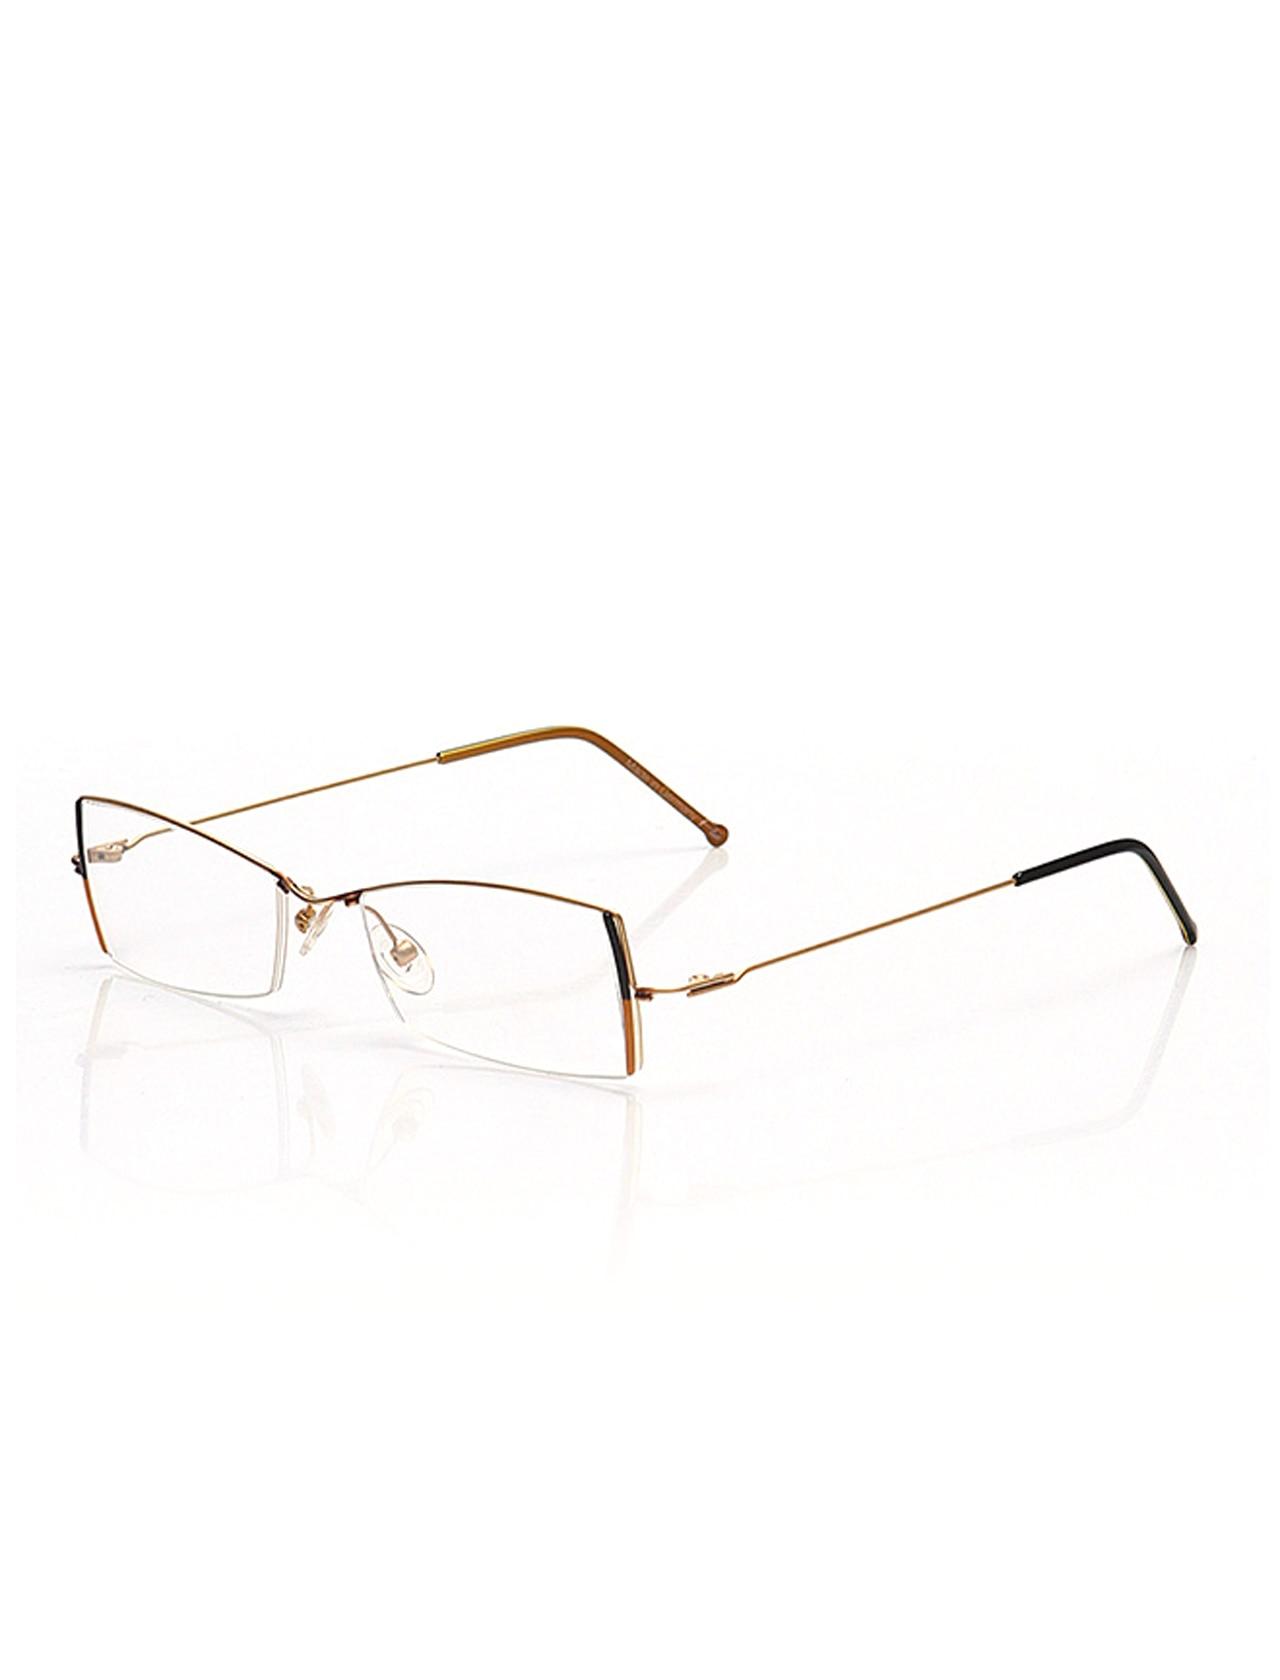 Markamilla Women Reading Glasses Frame Demo Glasses Eyewear Transparent High Quality WomenFlair FLR 454 045 49